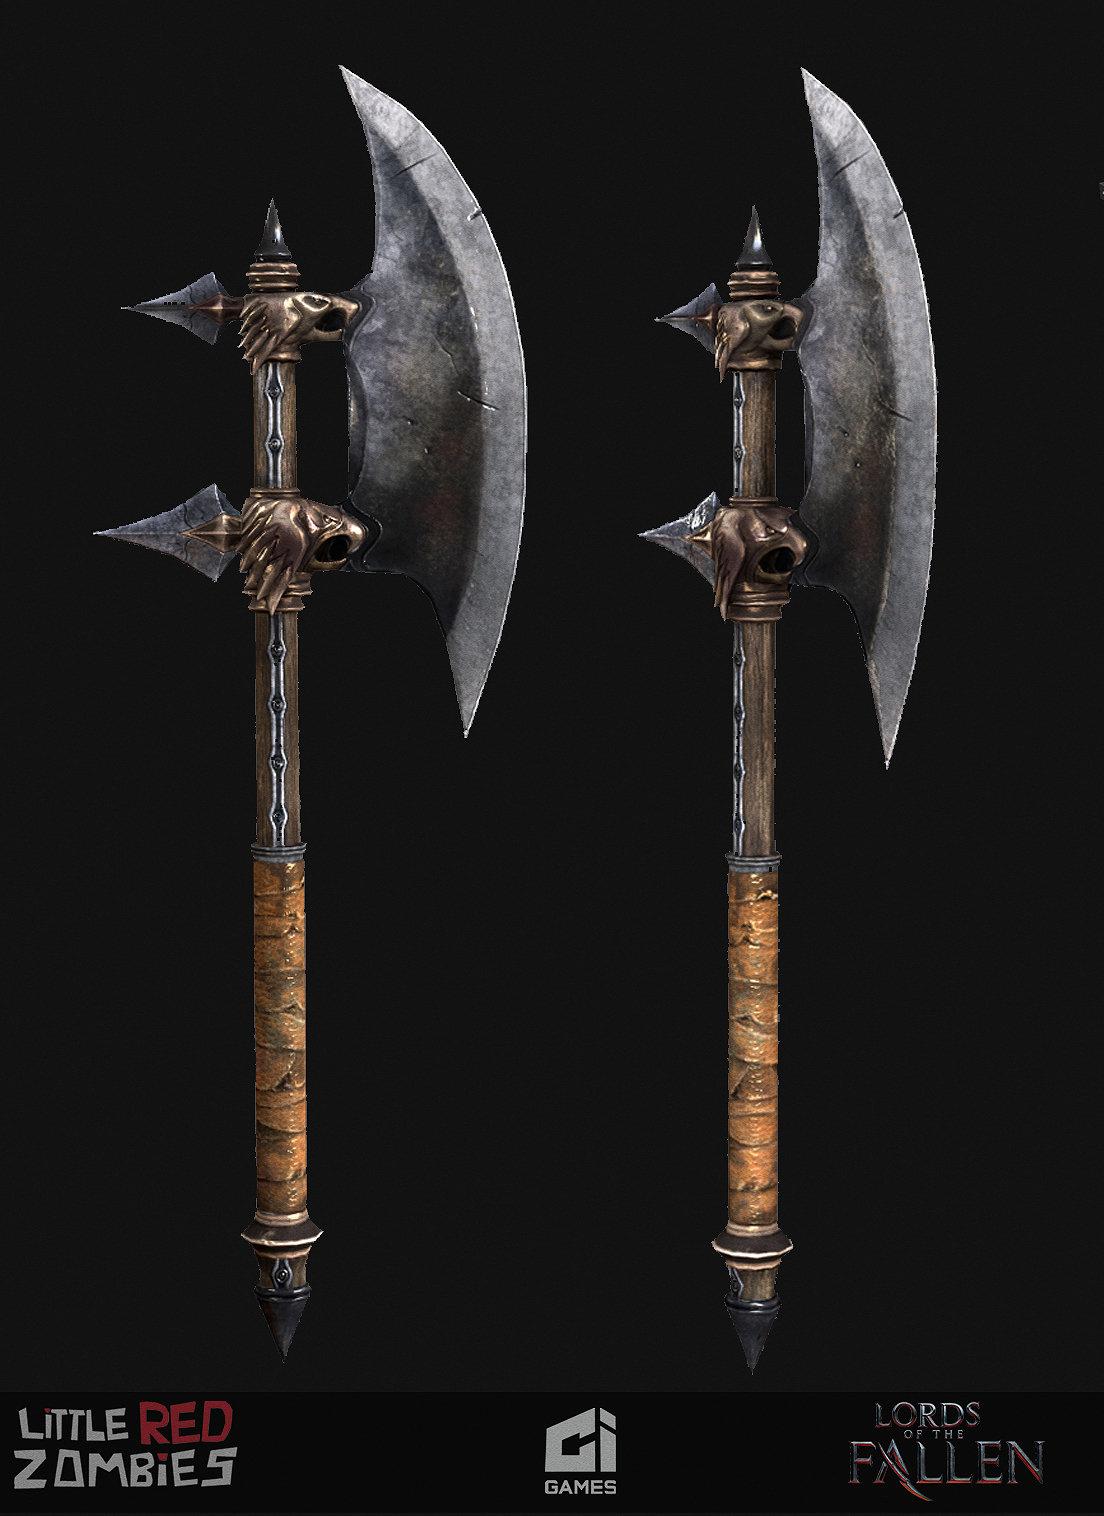 Vimal kerketta weapon guardian lotf